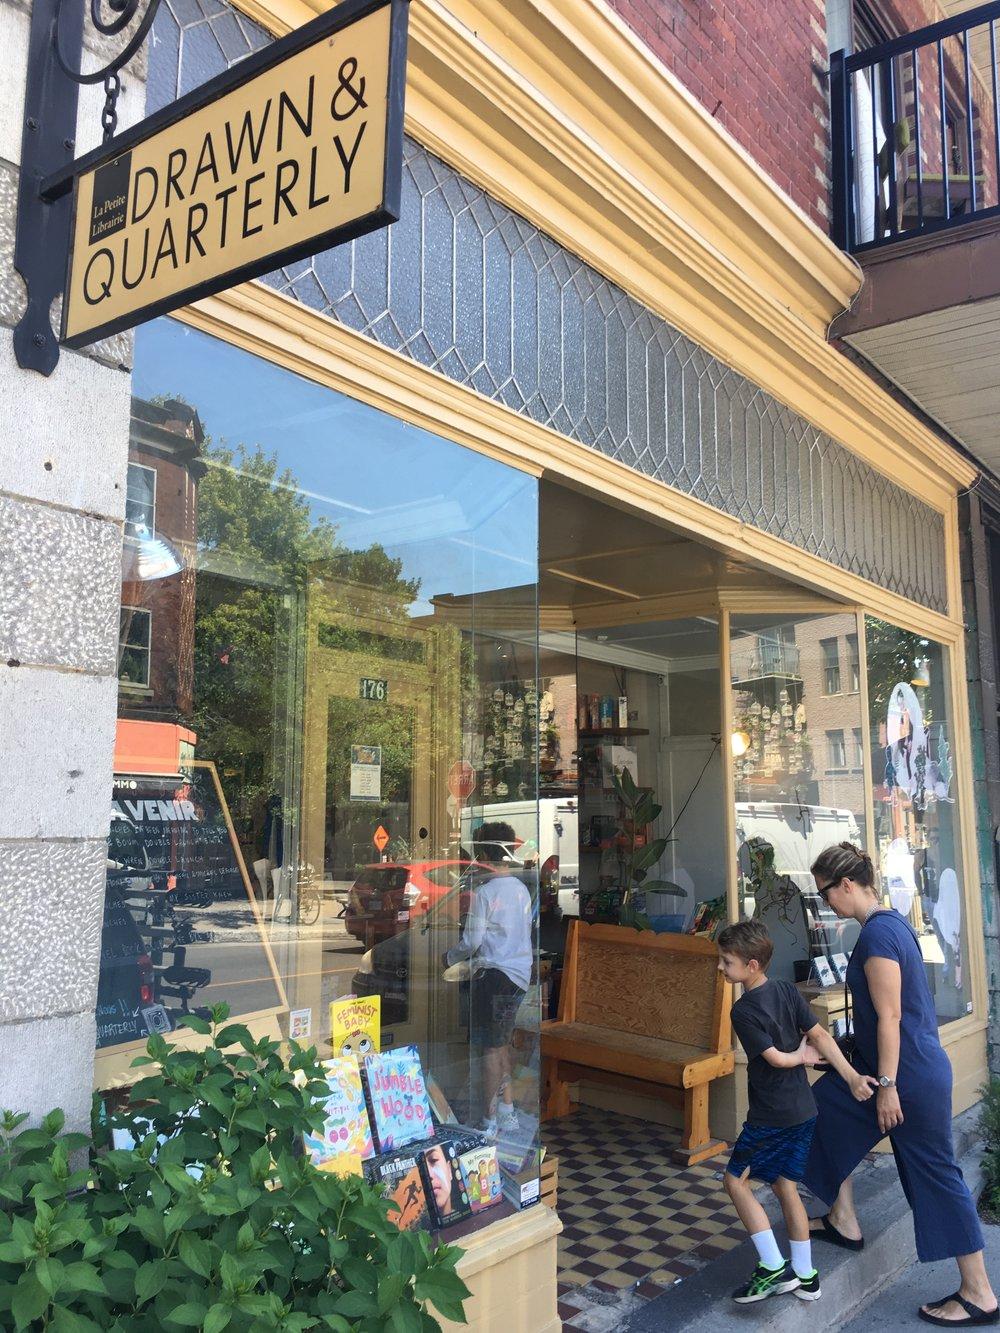 La Petite Librairie Drawn & Quarterly in Montreal.jpg